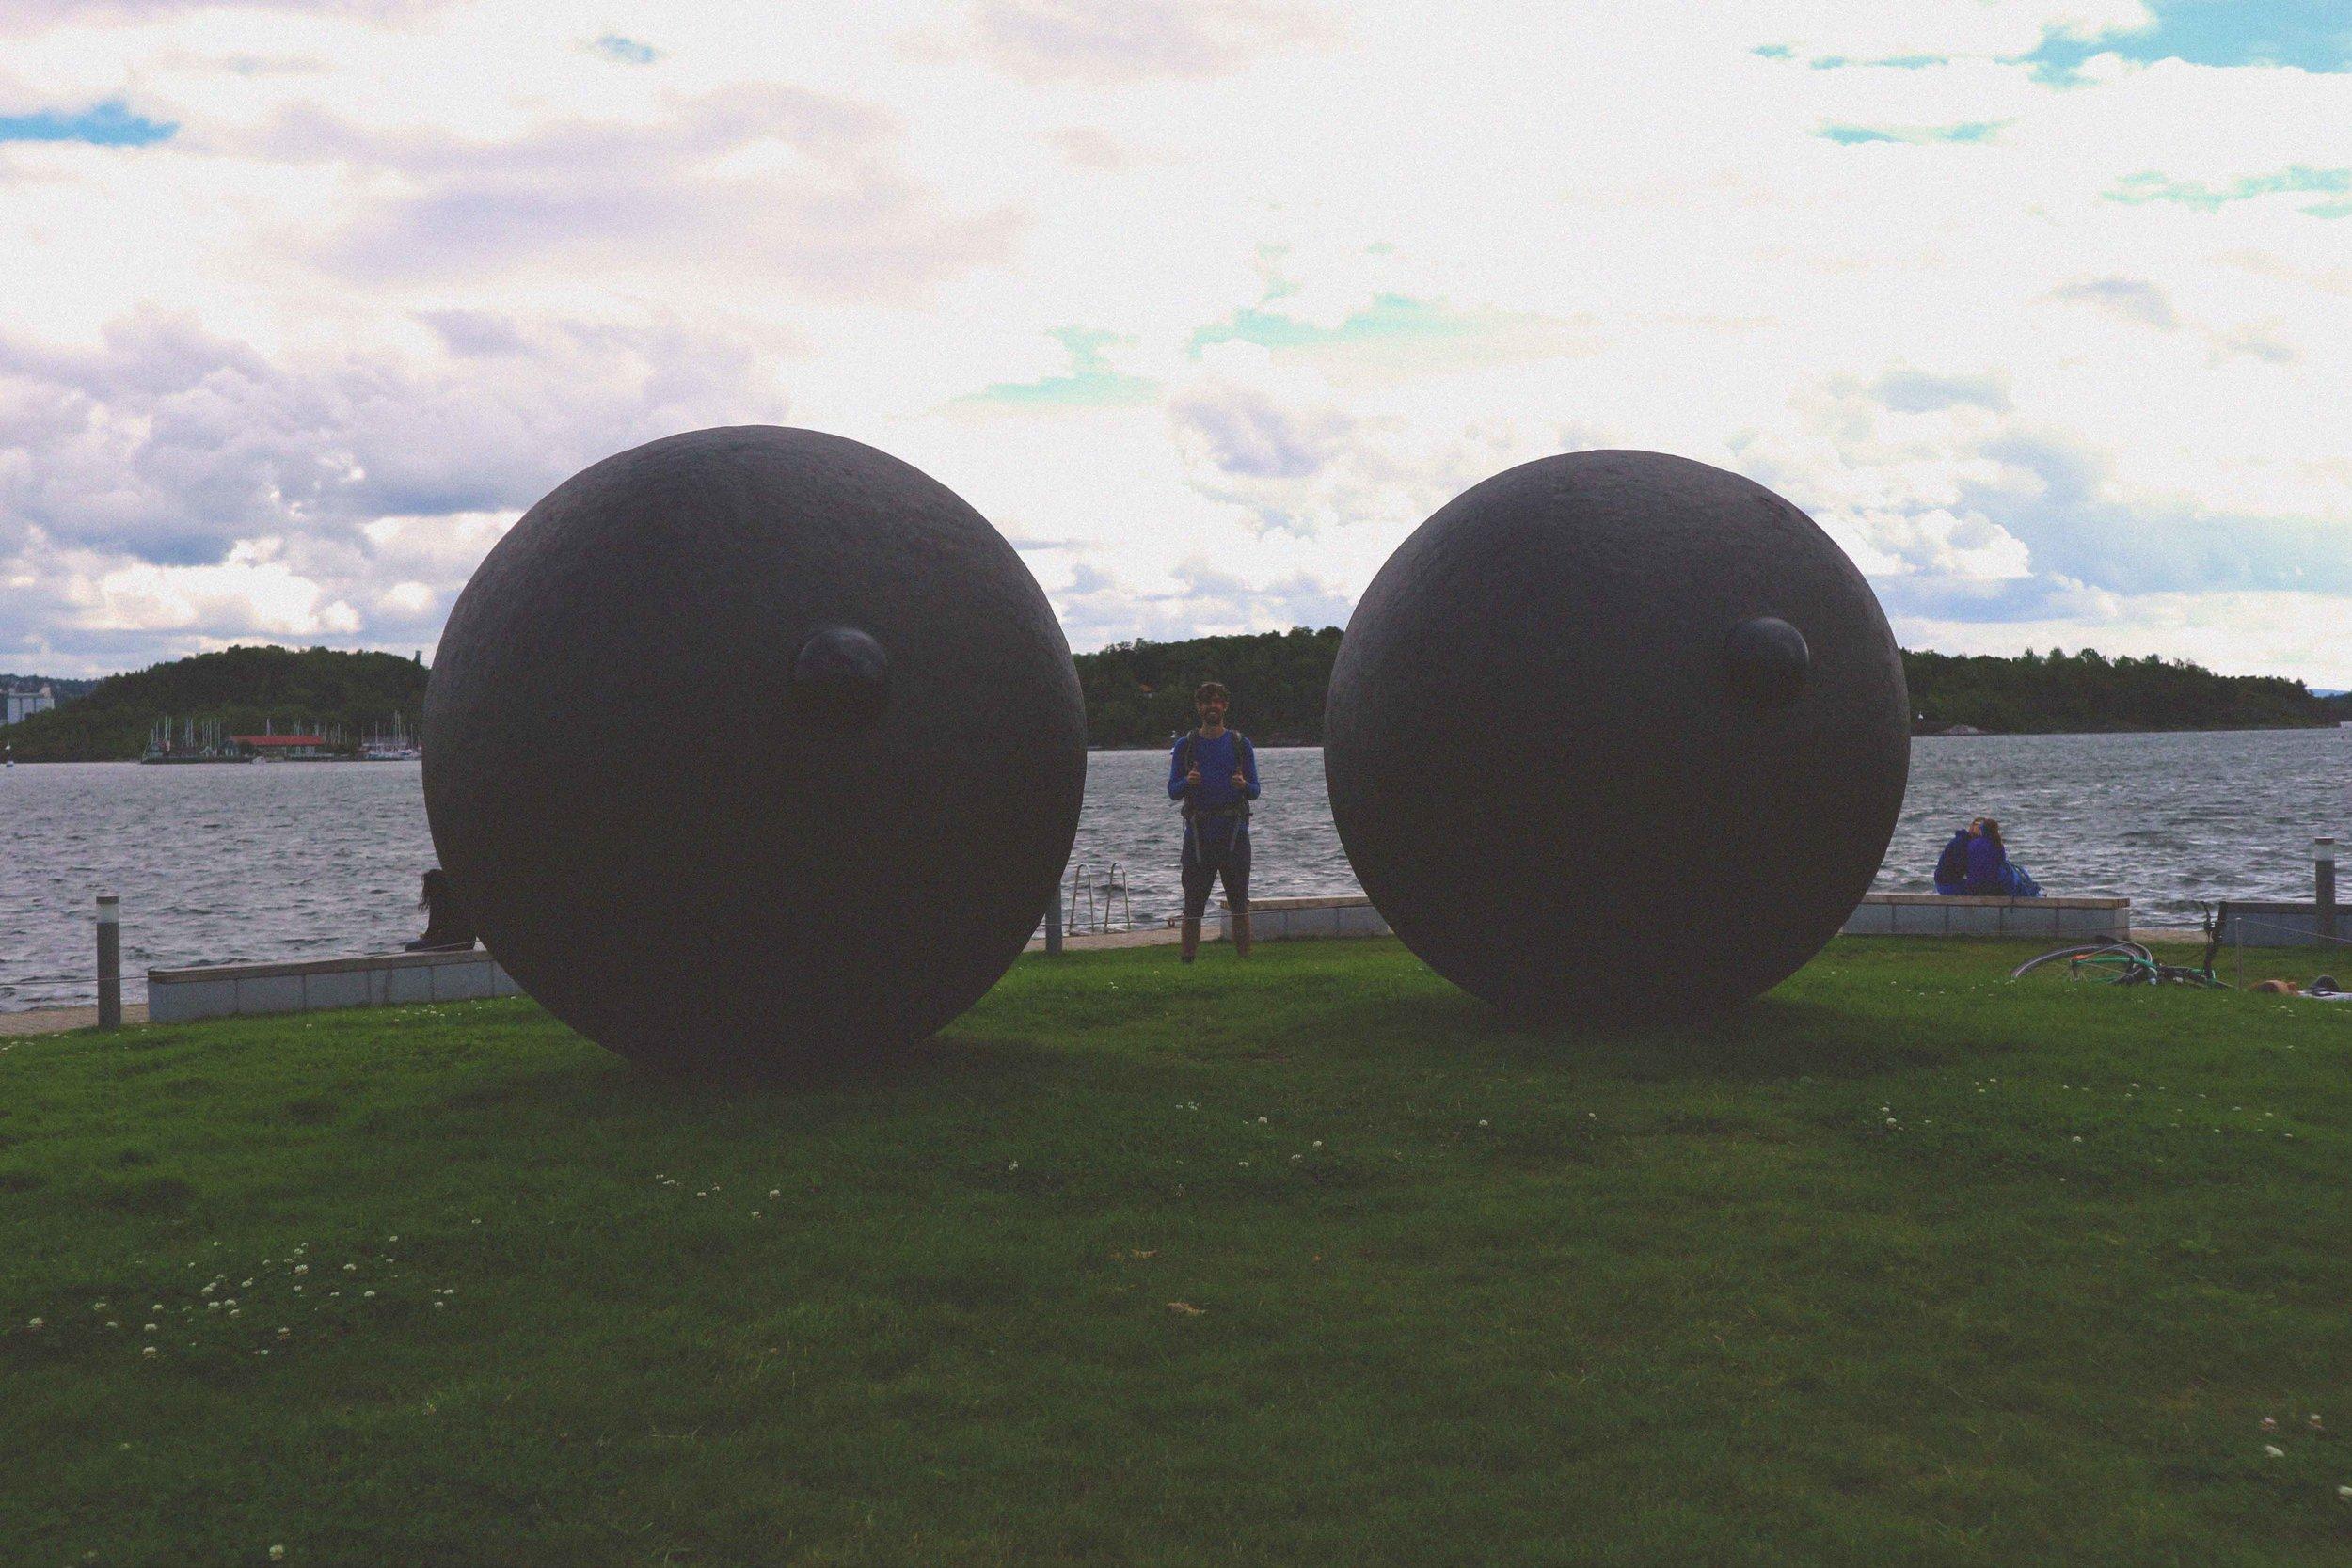 oslo sculpture.jpg